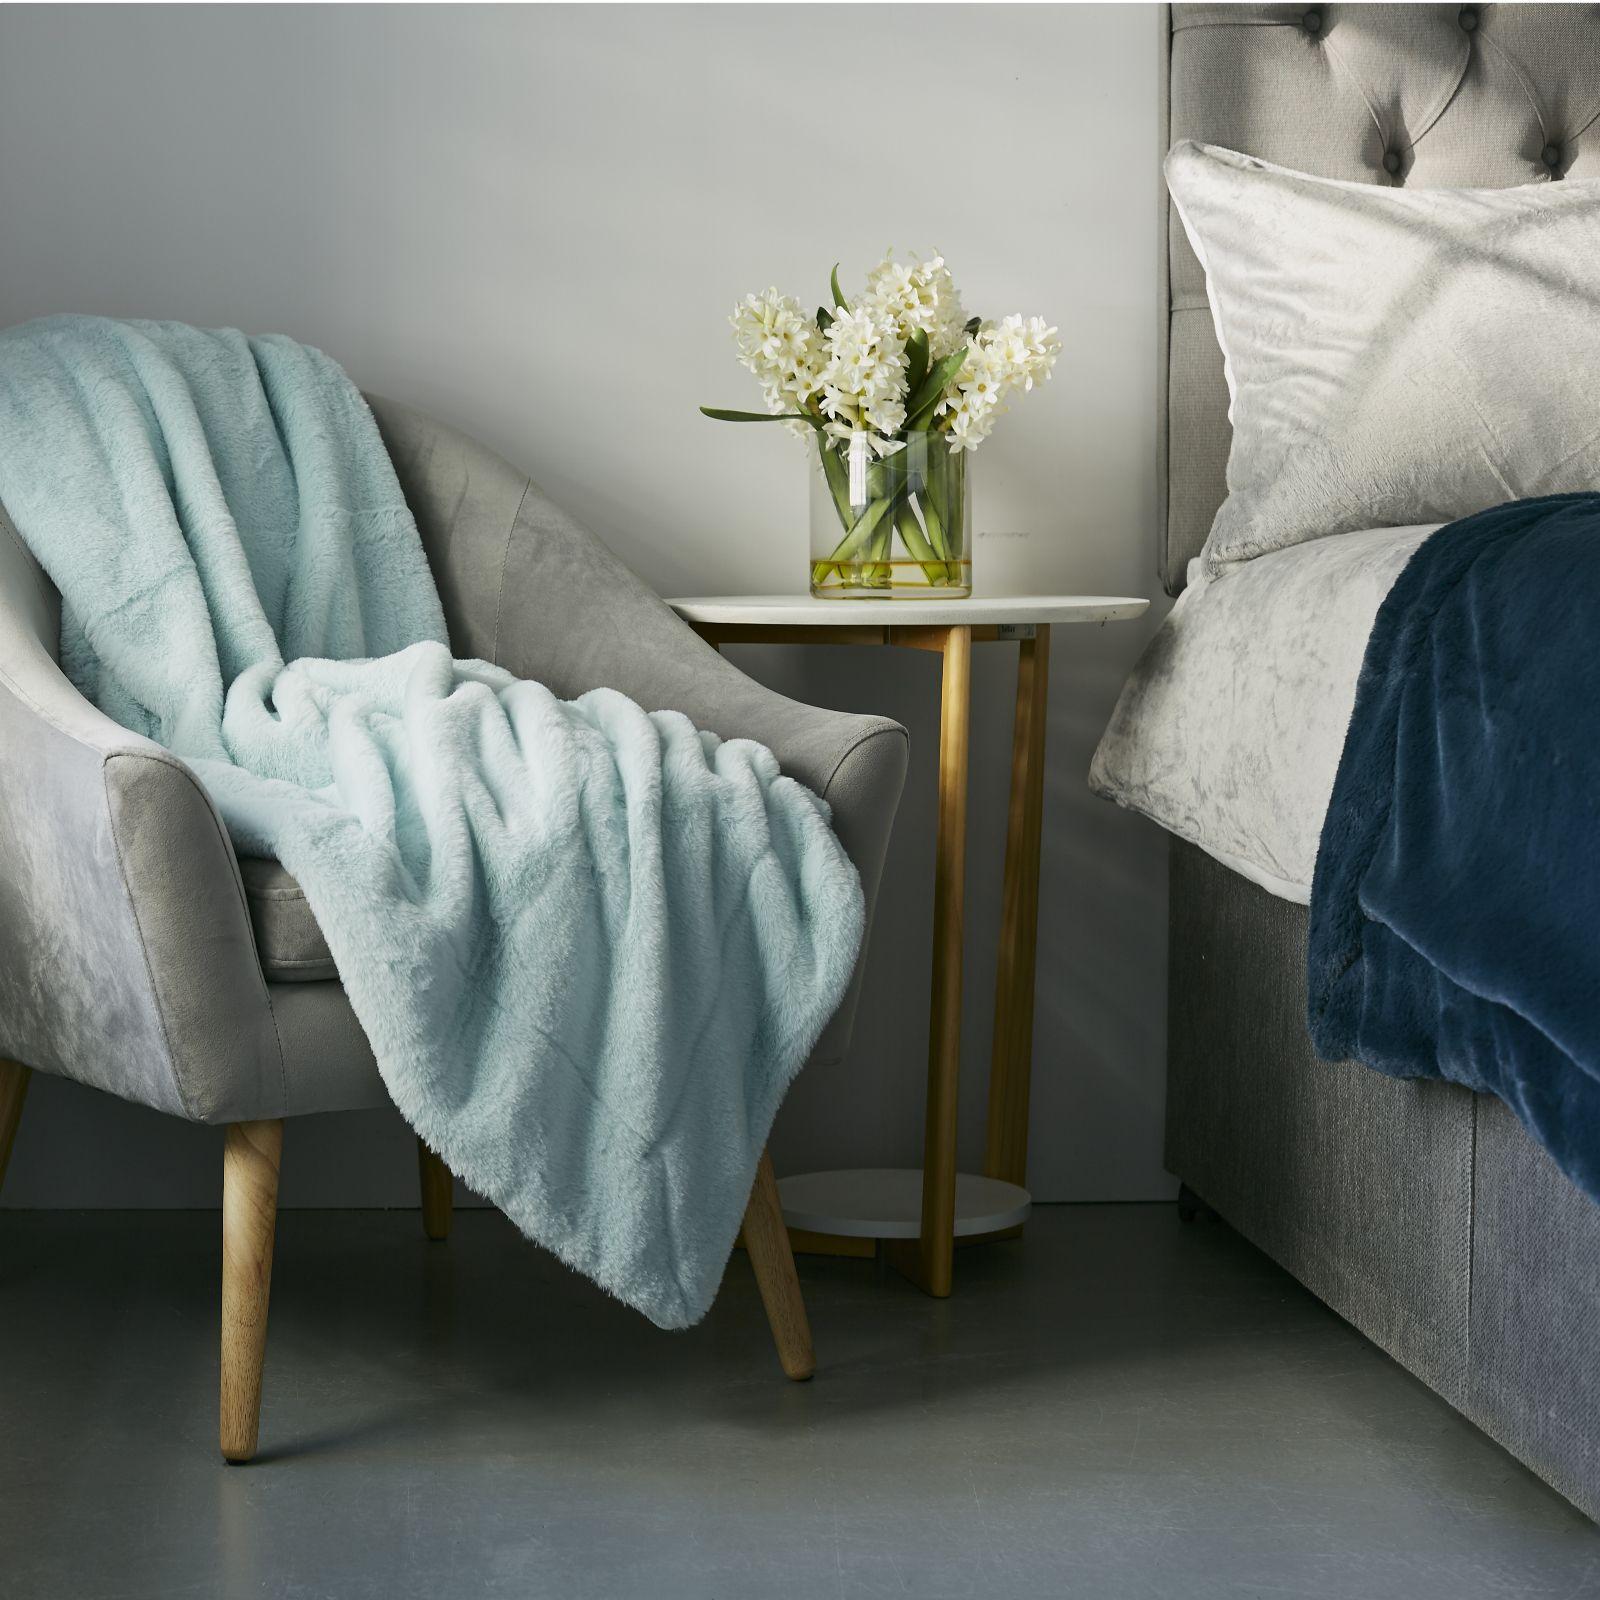 new Light Teal Cozee Home Reversible Luxury Faux Fur /& Velvet Plush Throw